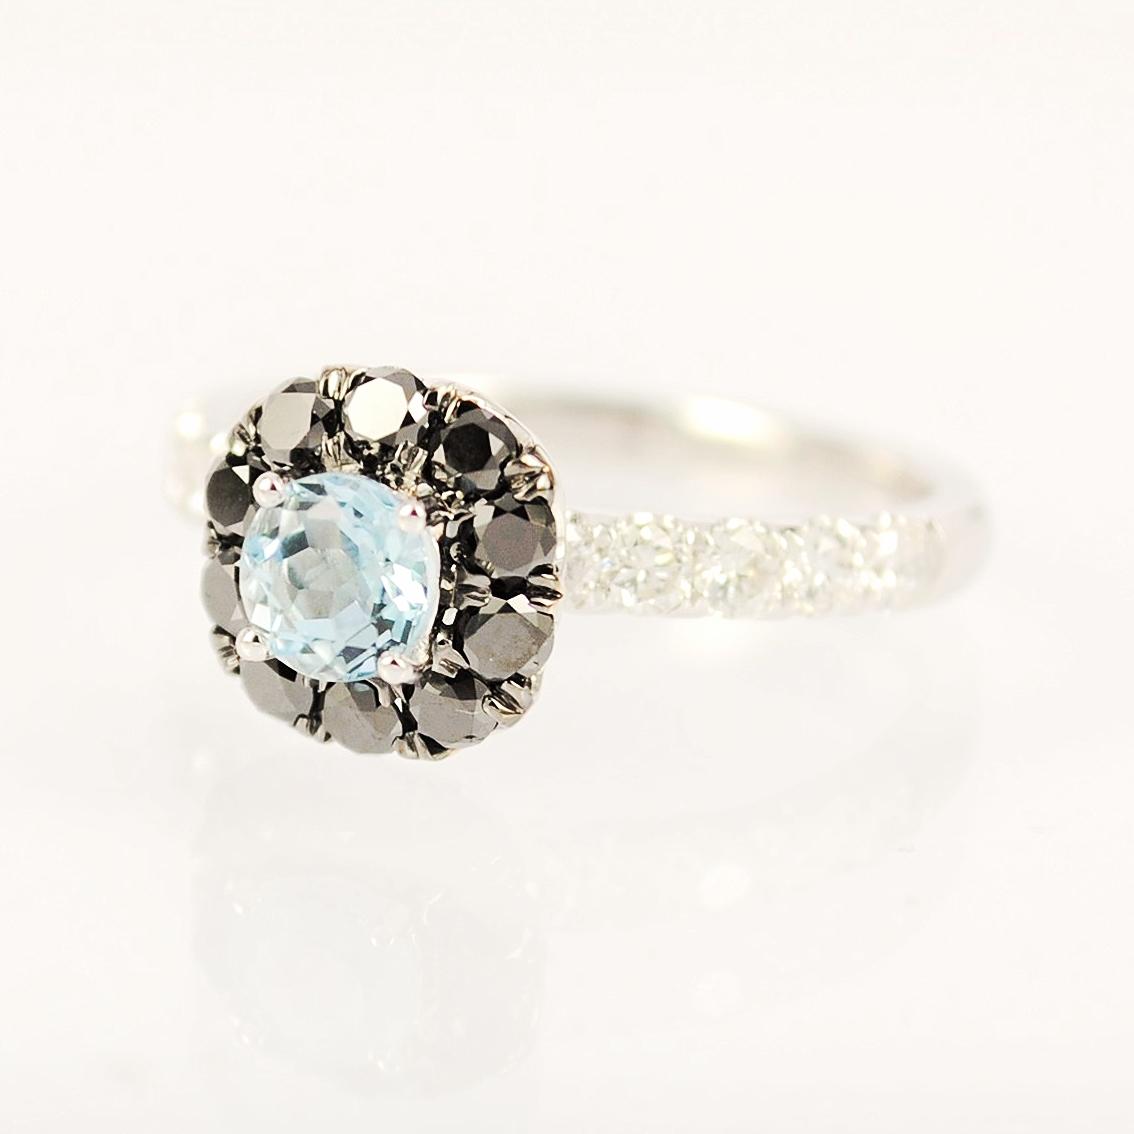 Round Aquamarine halo set with black diamonds & white round brilliant diamonds on band